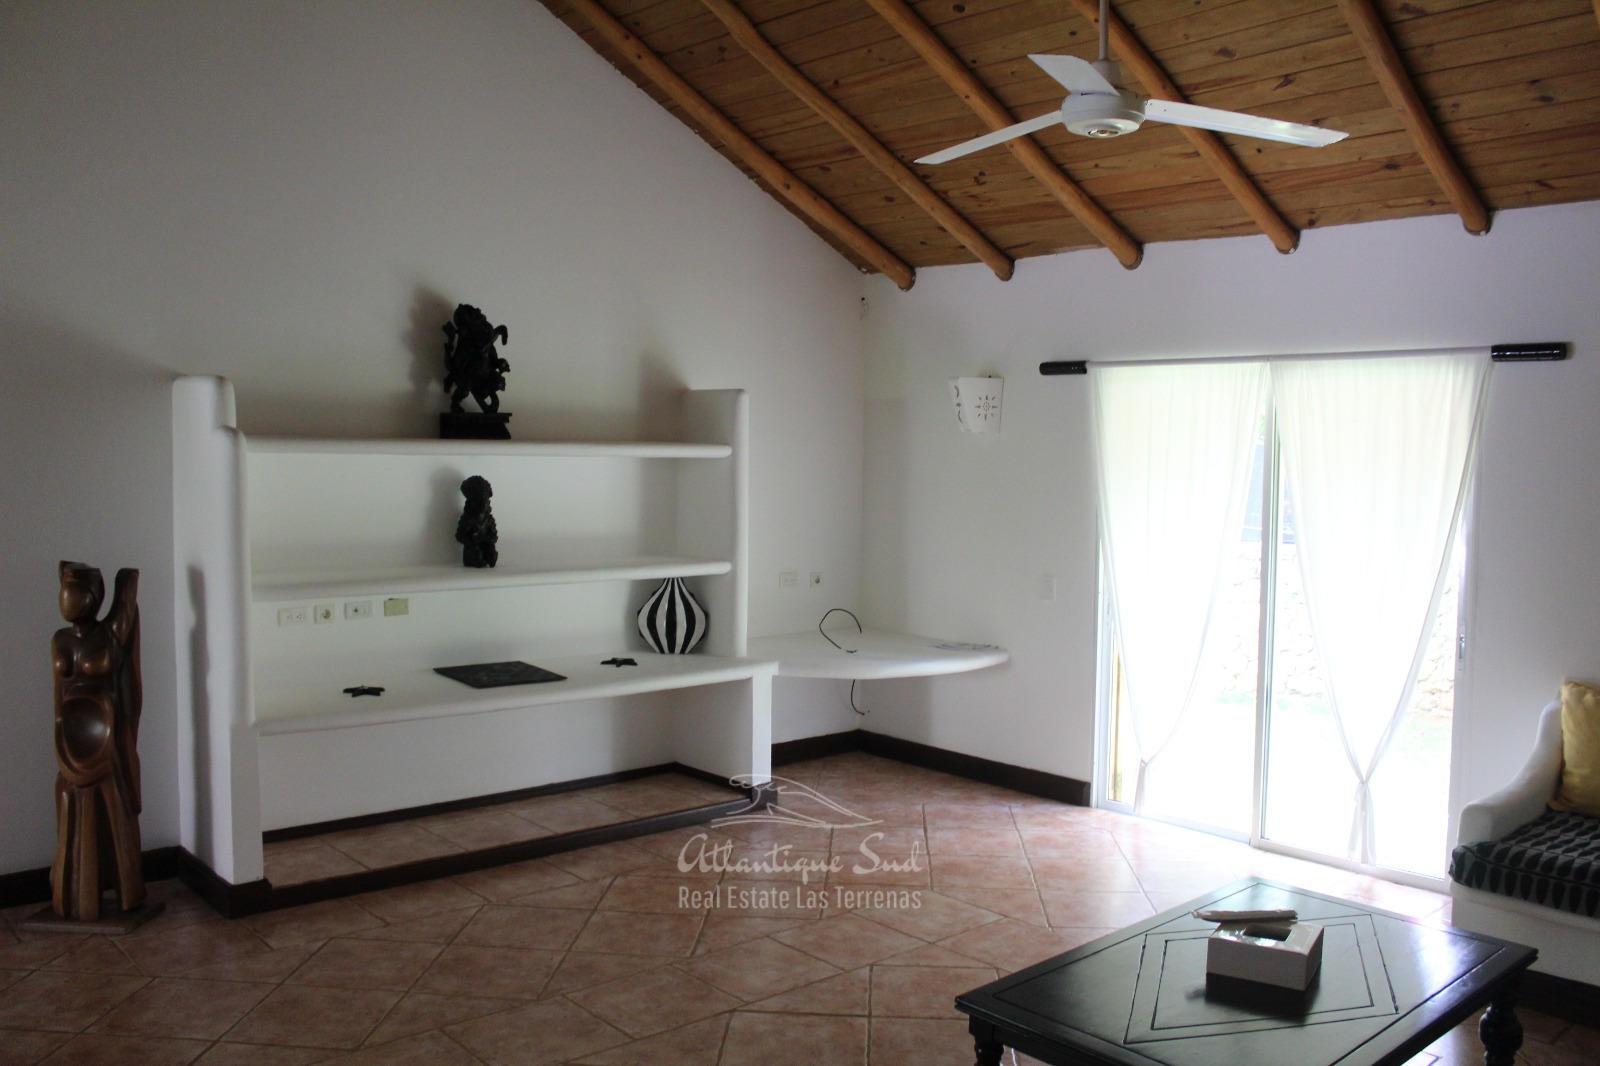 Villa Authentic Carribean Real Estate Las Terrenas Dominican Republic28.jpg